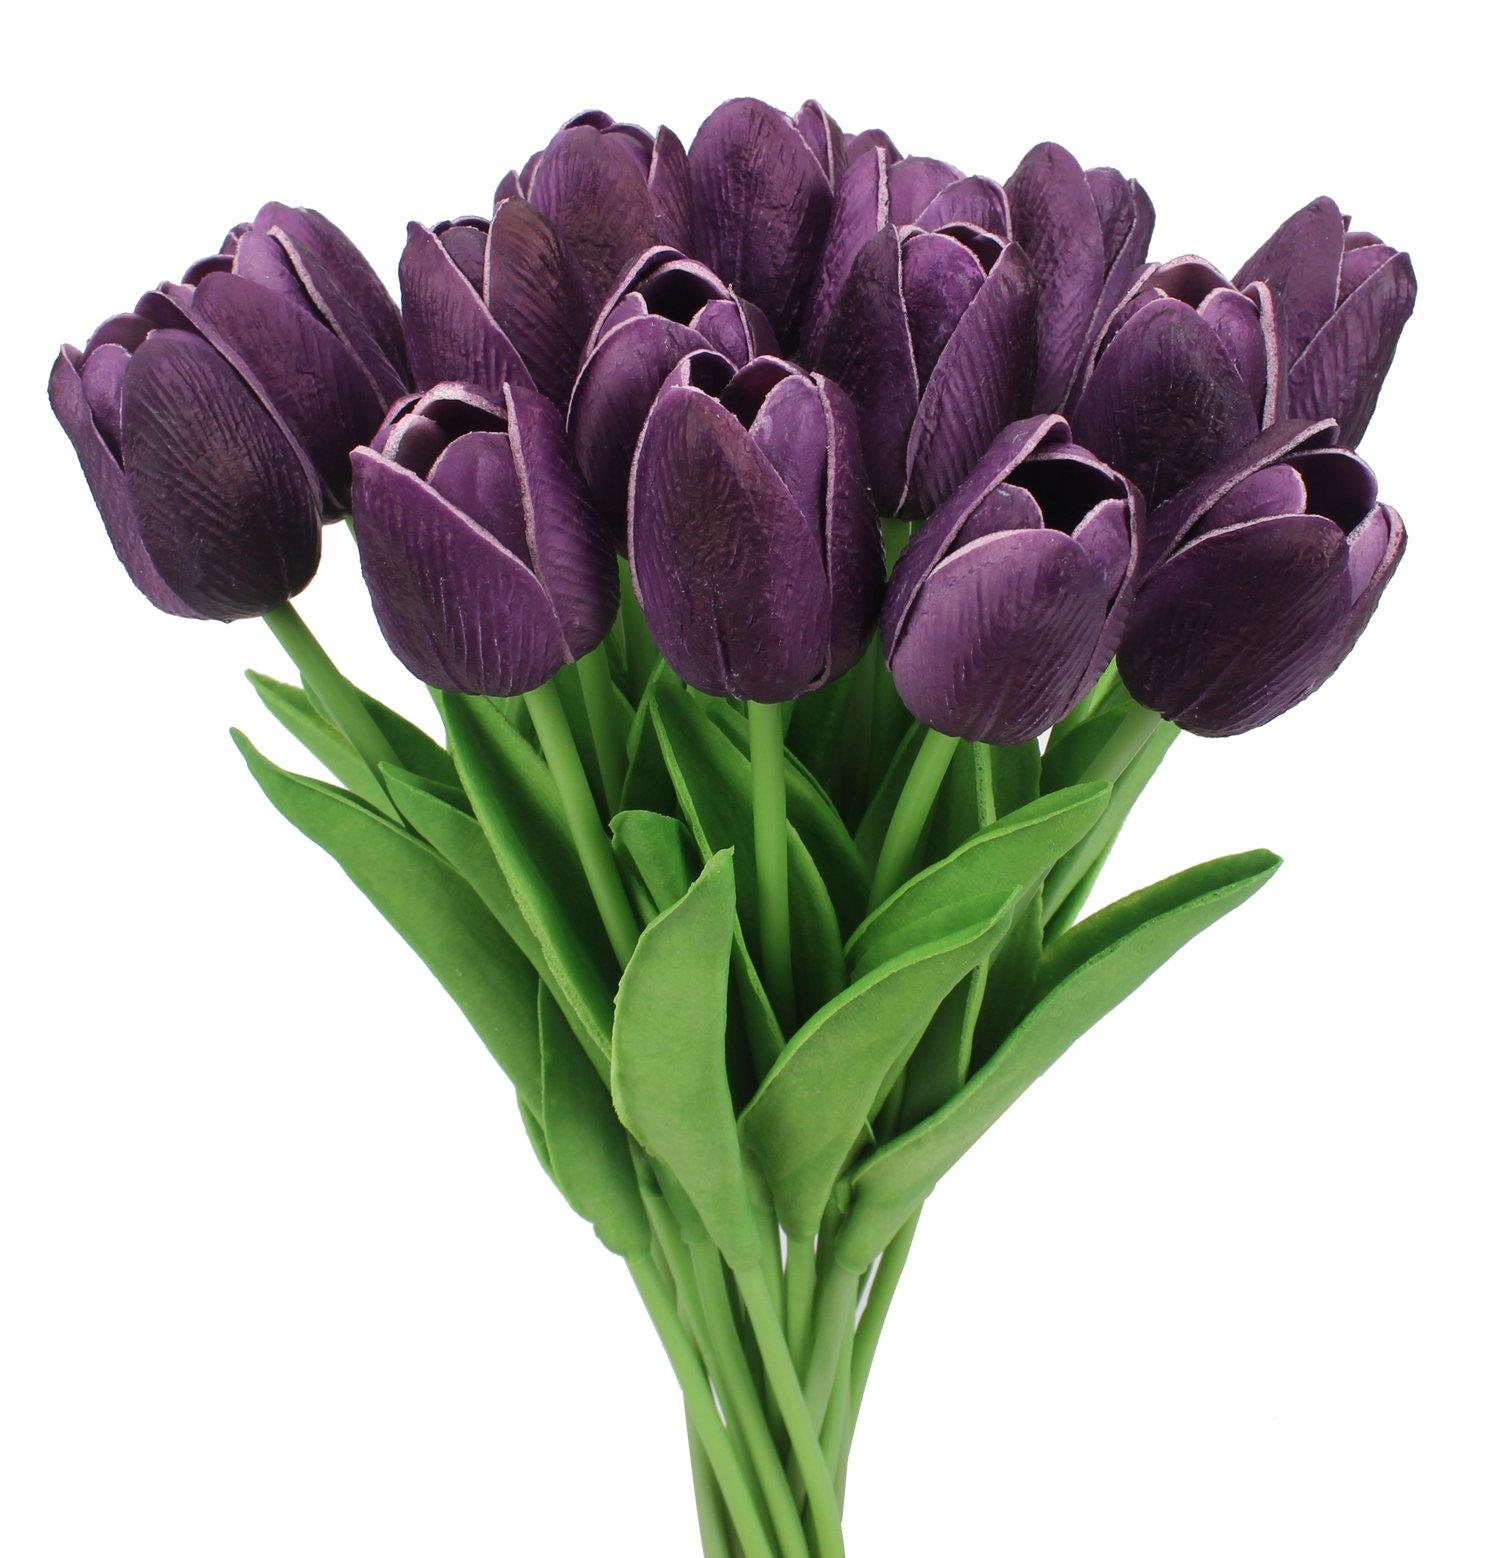 Duovlo-18-Heads-Artificial-Mini-Tulips-Real-Touch-Wedding-Flowers-Arrangement-Bouquet-Home-Room-Centerpiece-Decor